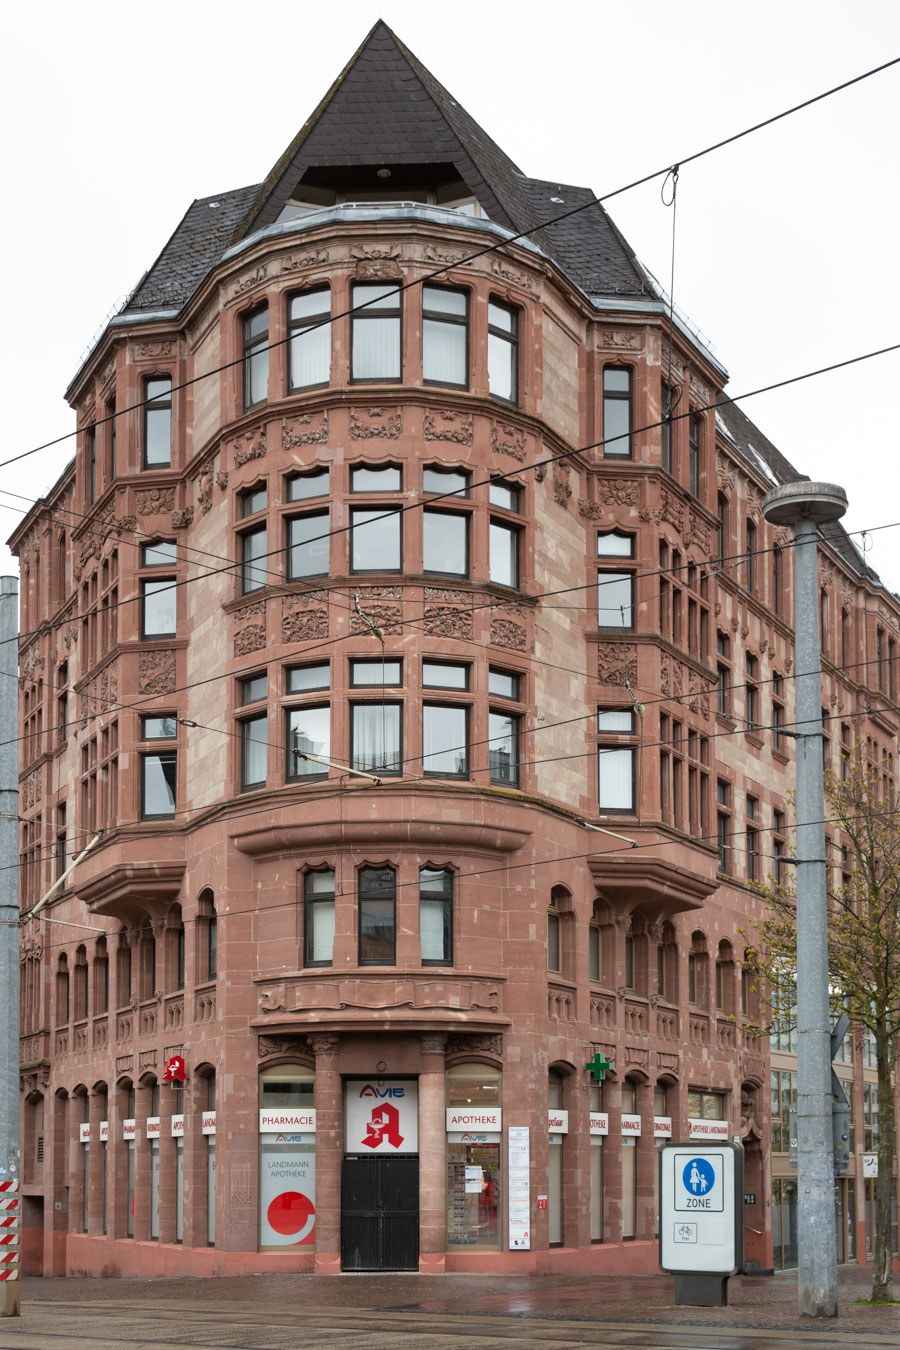 Landmann Apotheke Saarbrücken